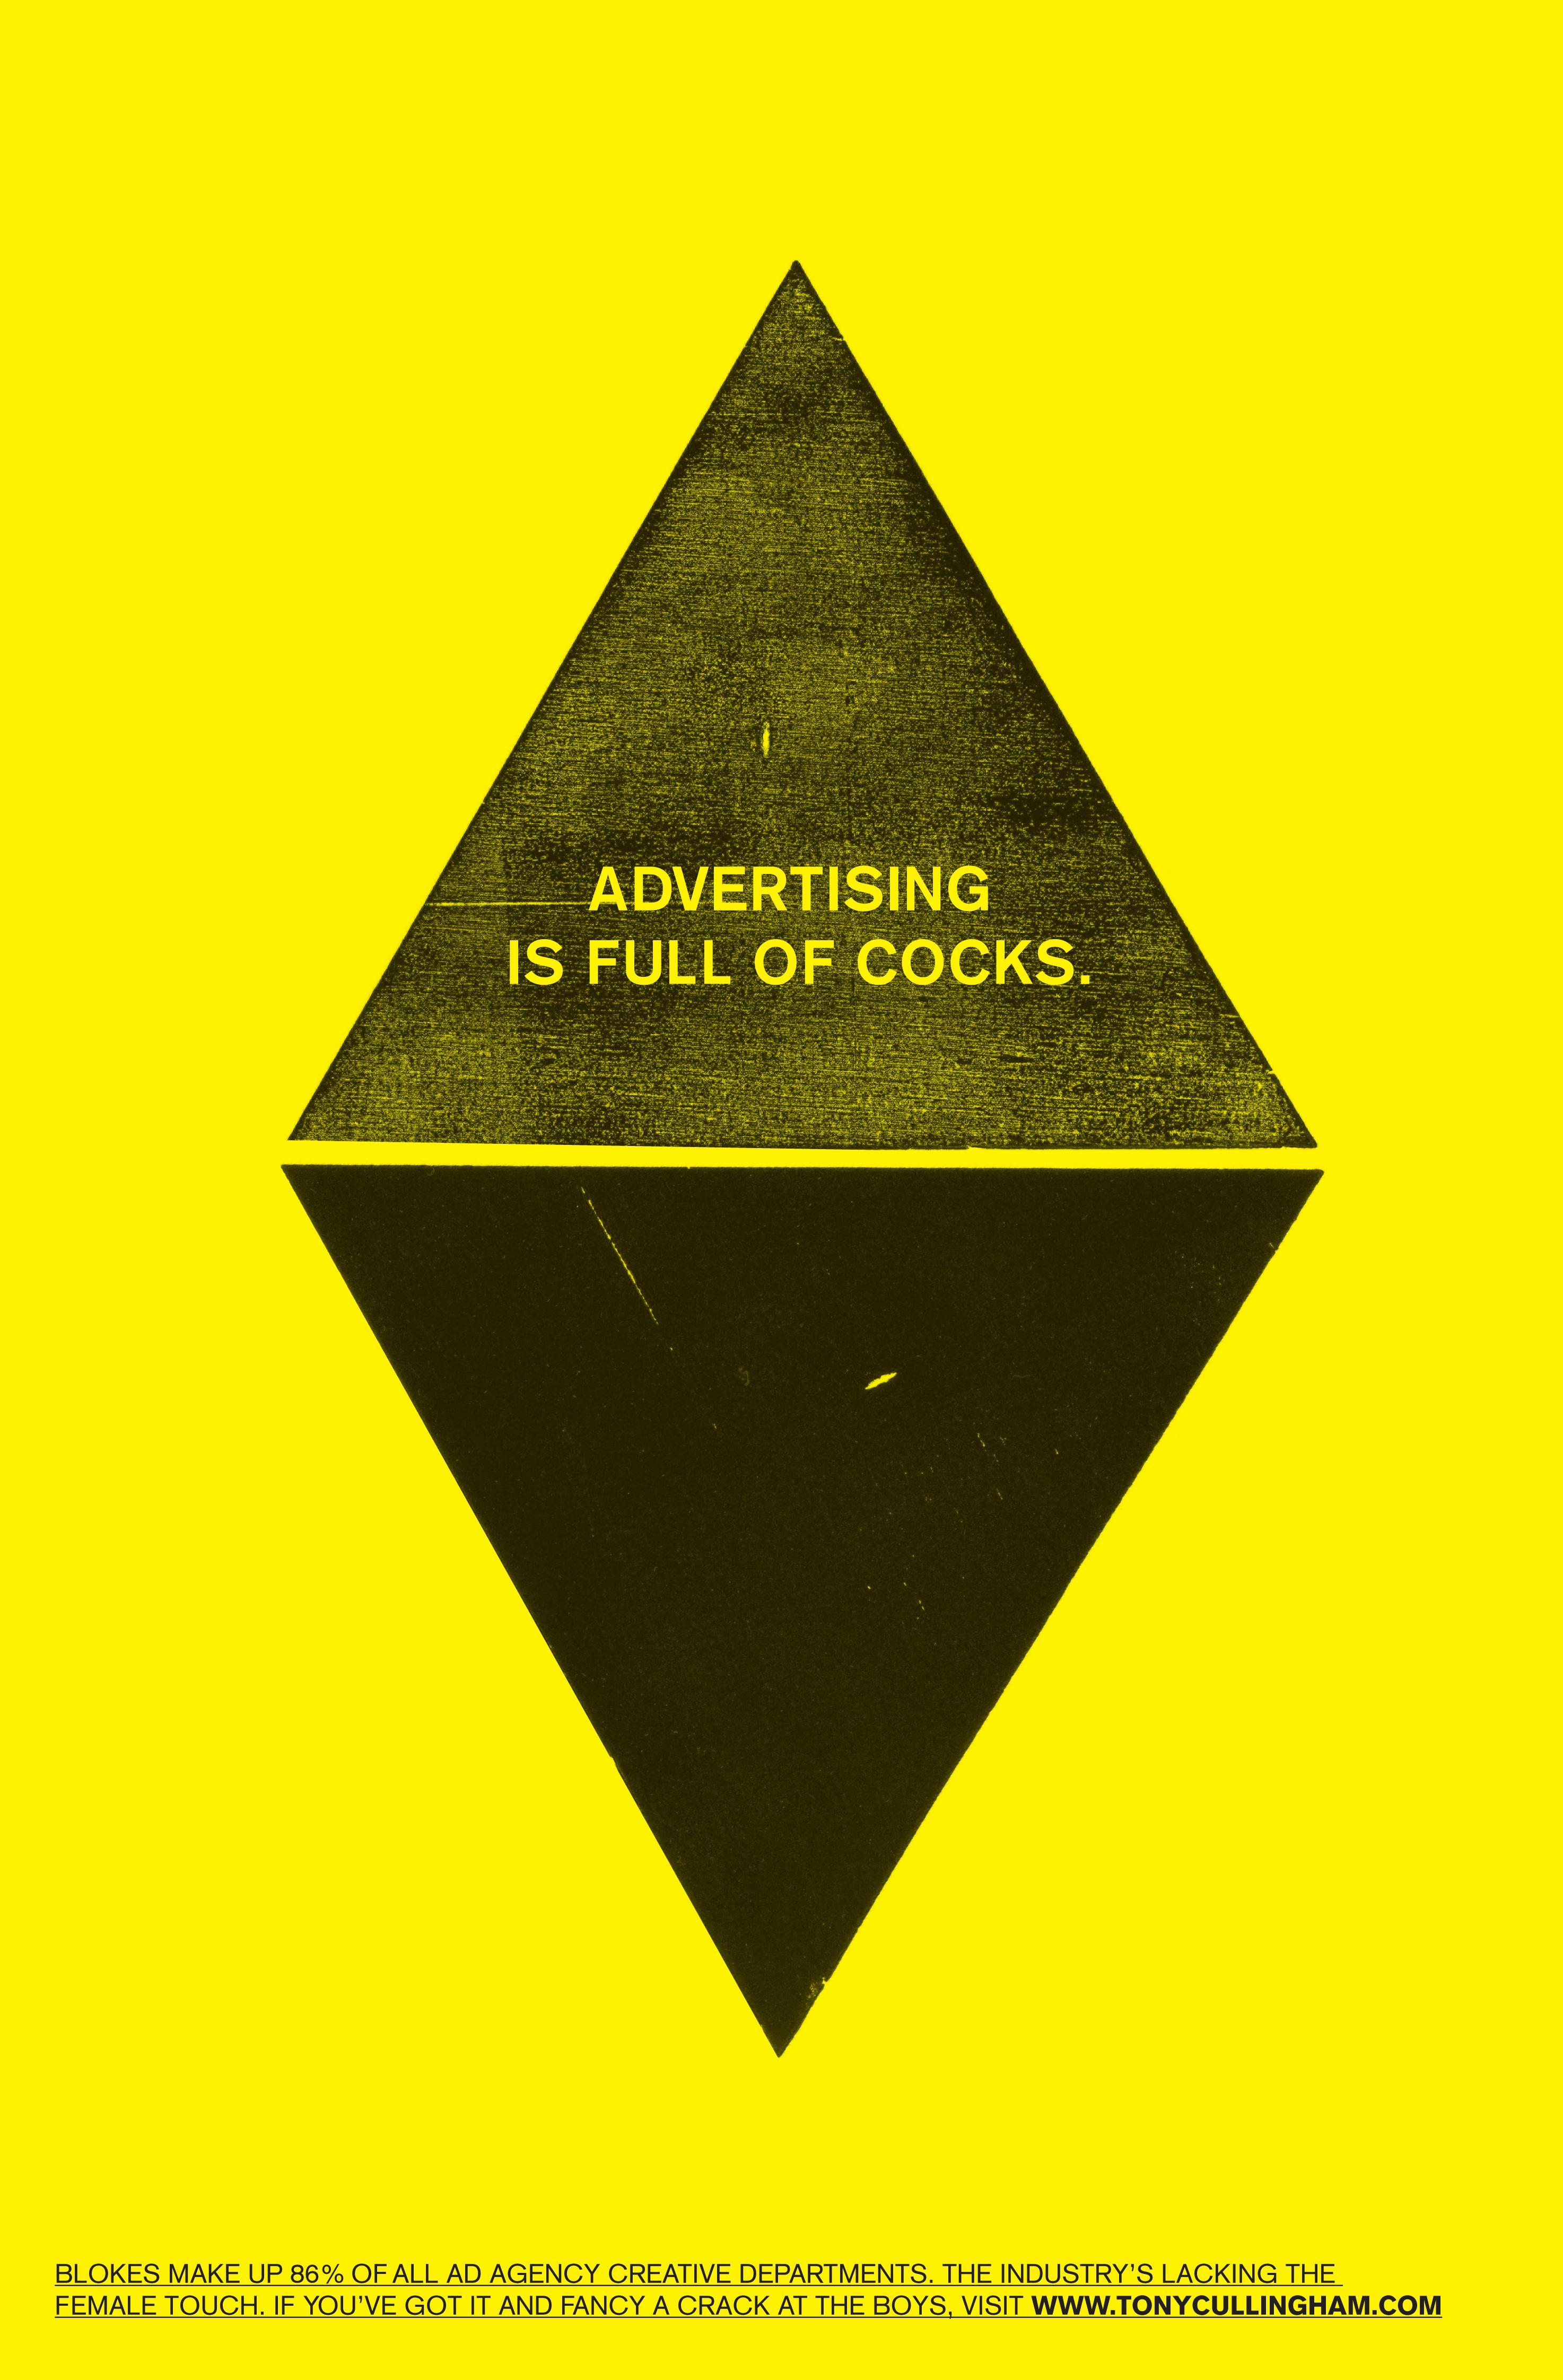 Watford College Print Ad - Cocks